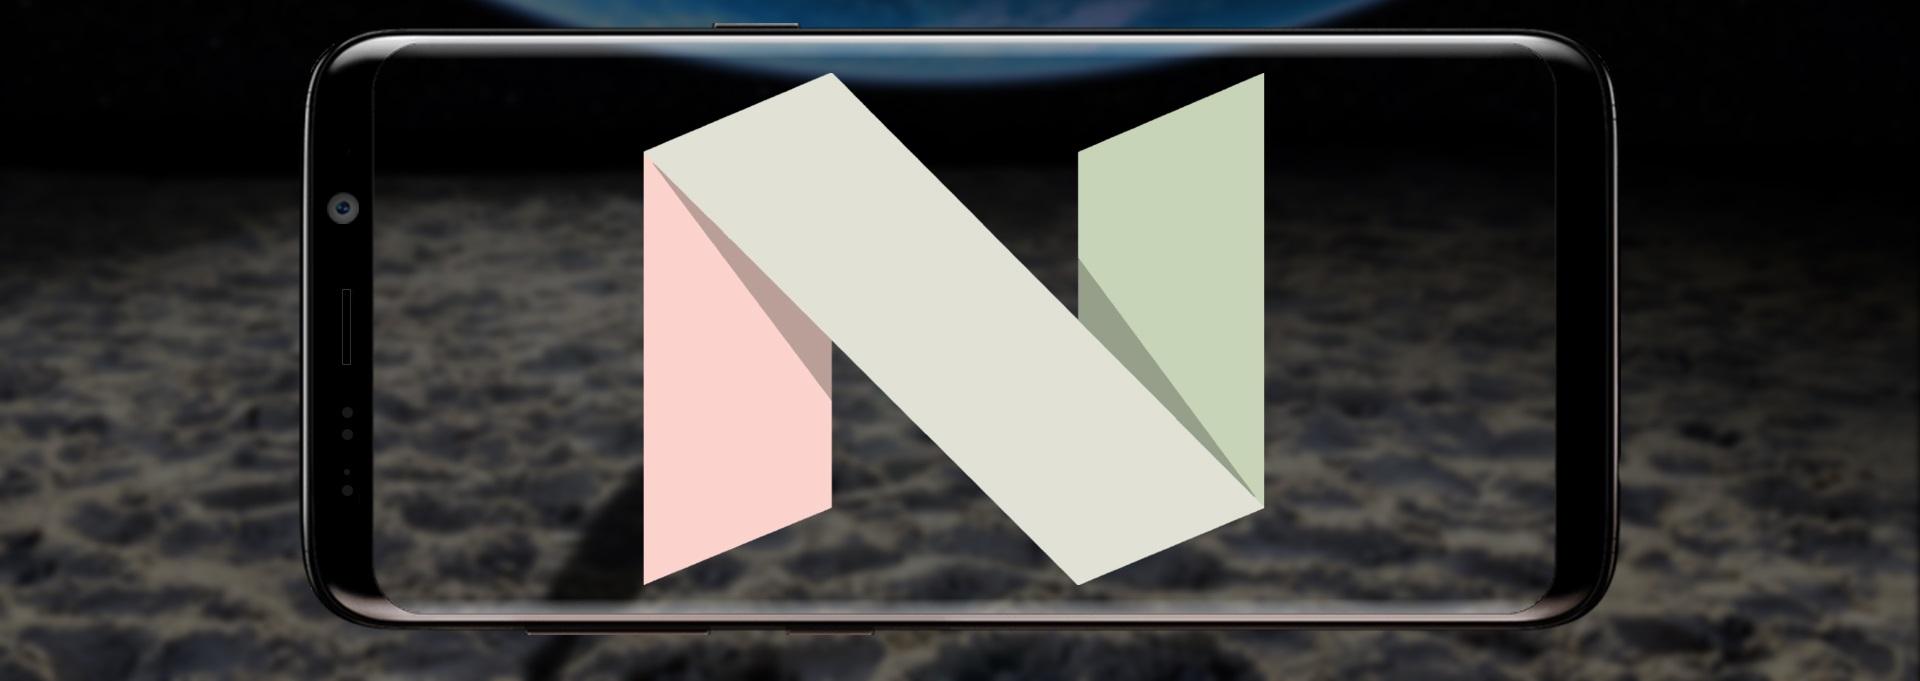 Meiigoo S8 Android Nougat